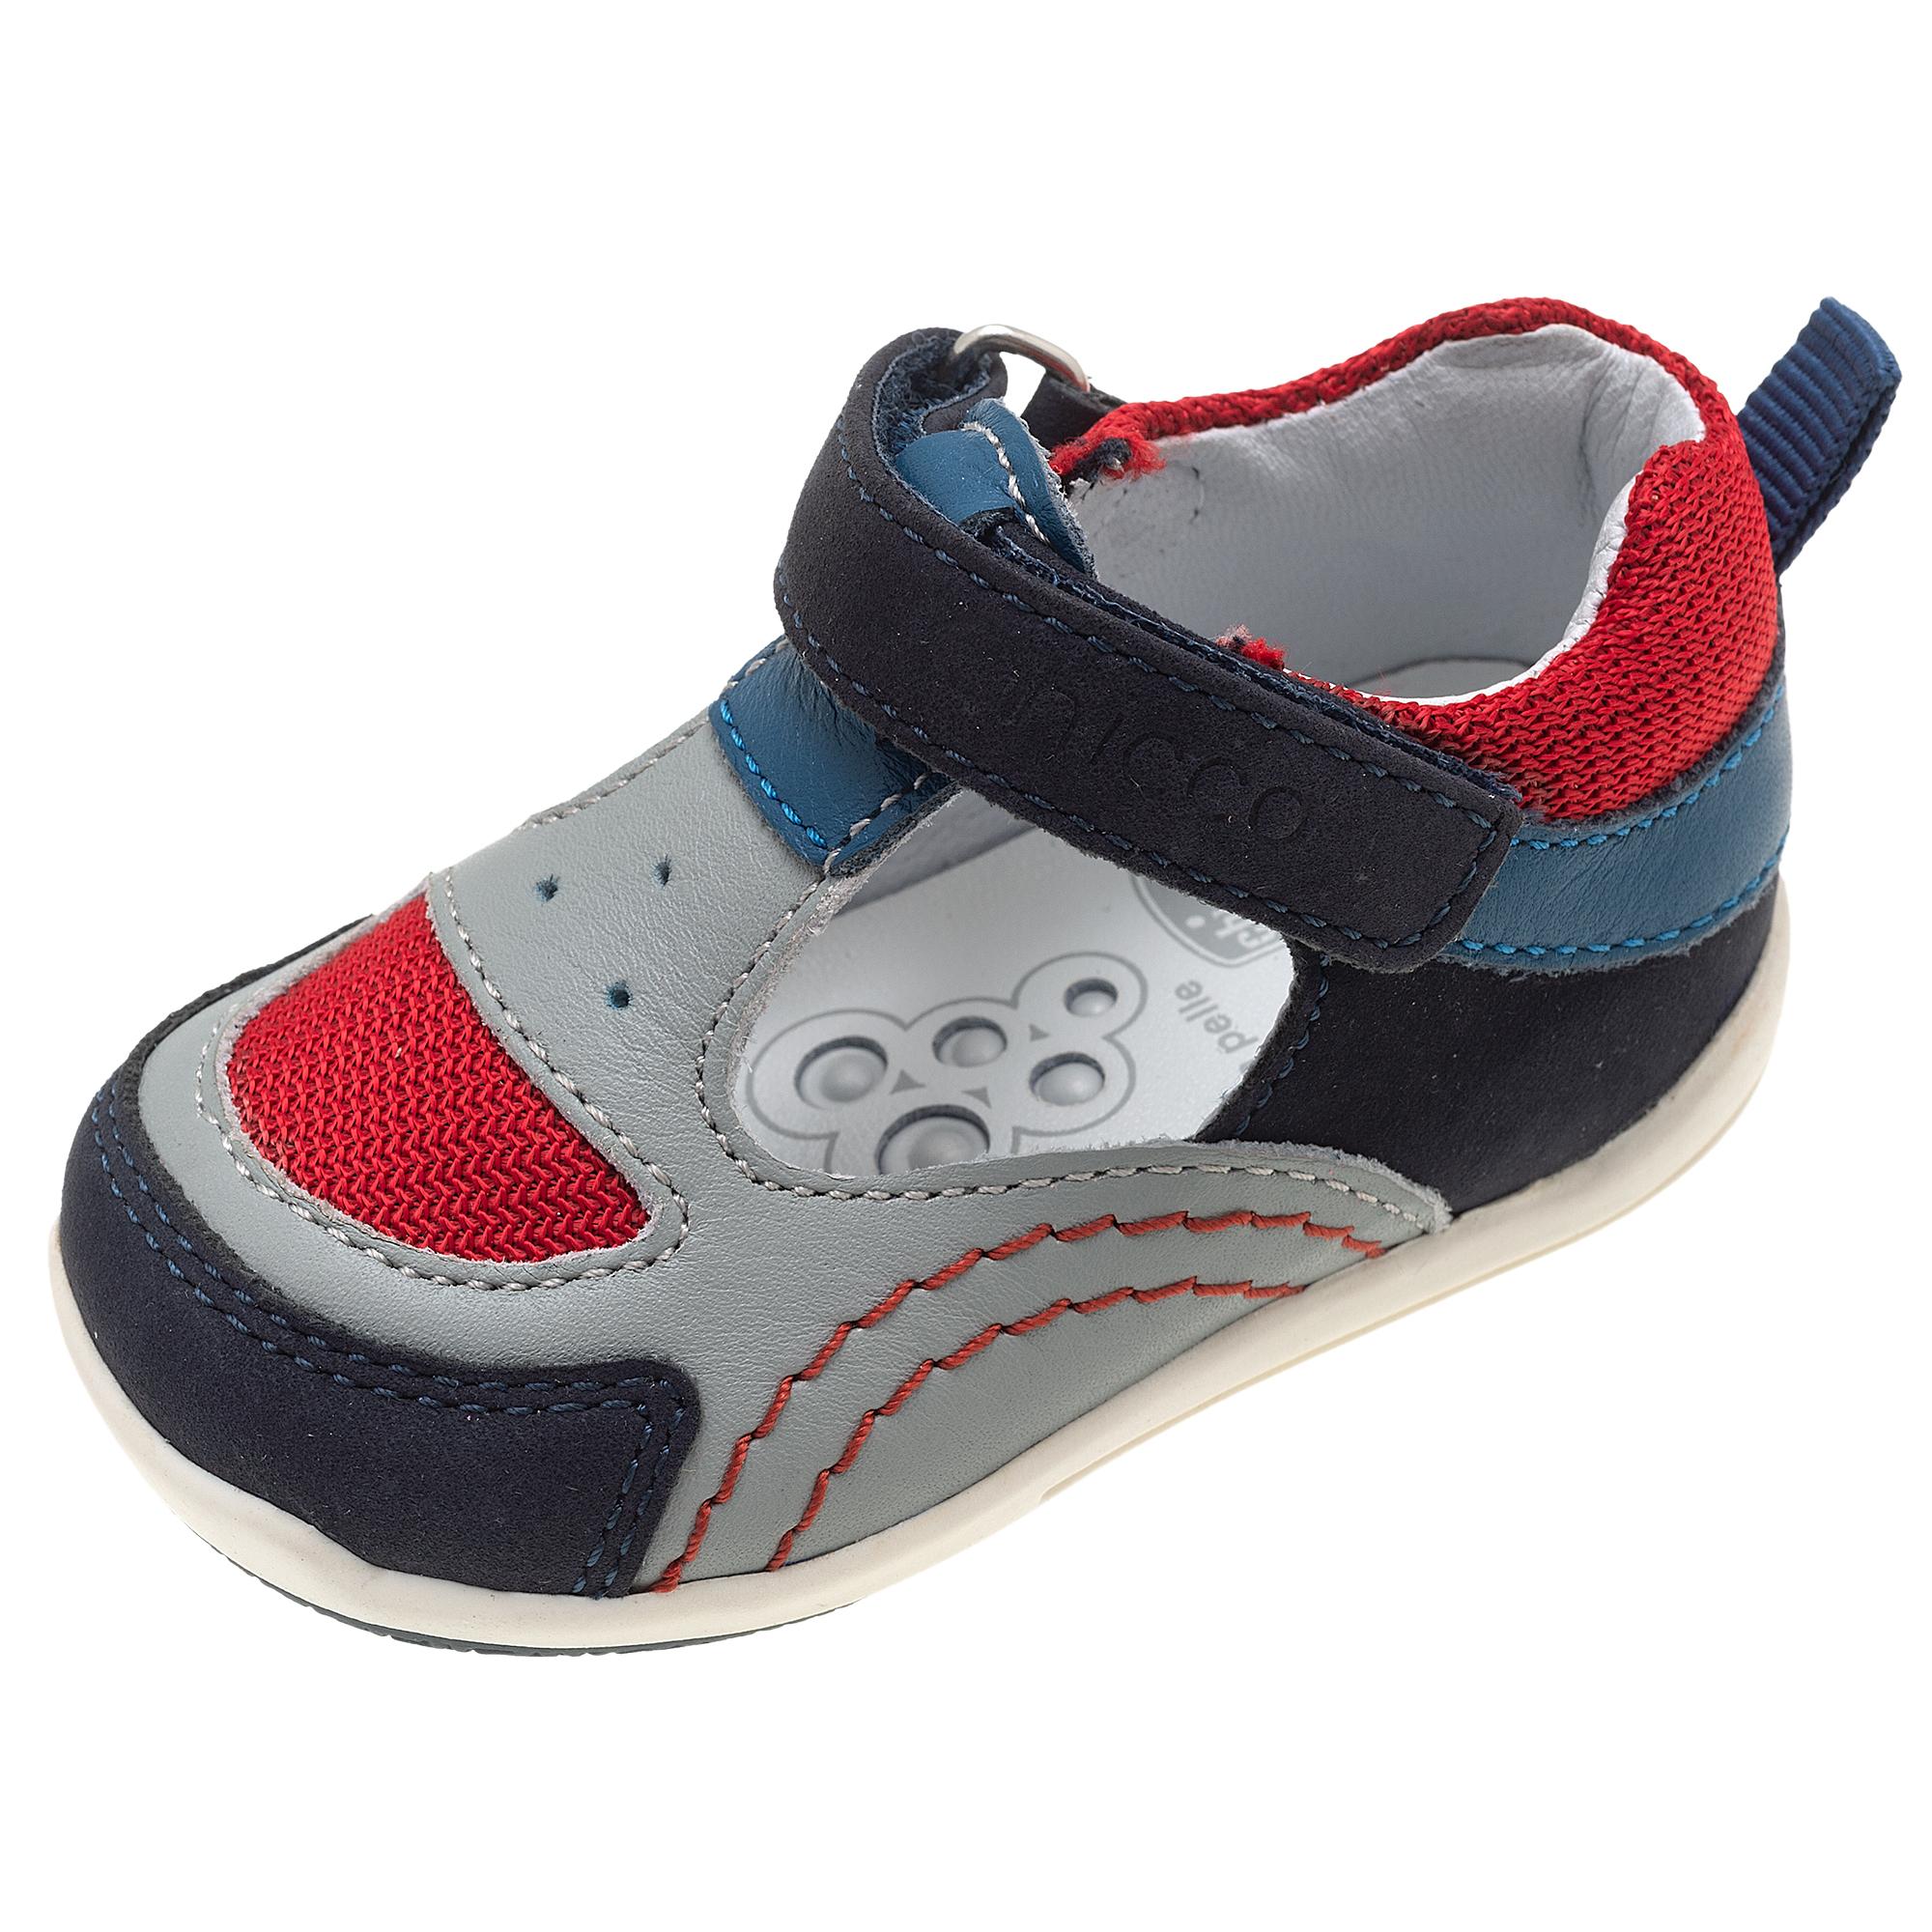 Sandale fetite Chicco G36, piele naturala gri, 61518 din categoria Sandale copii